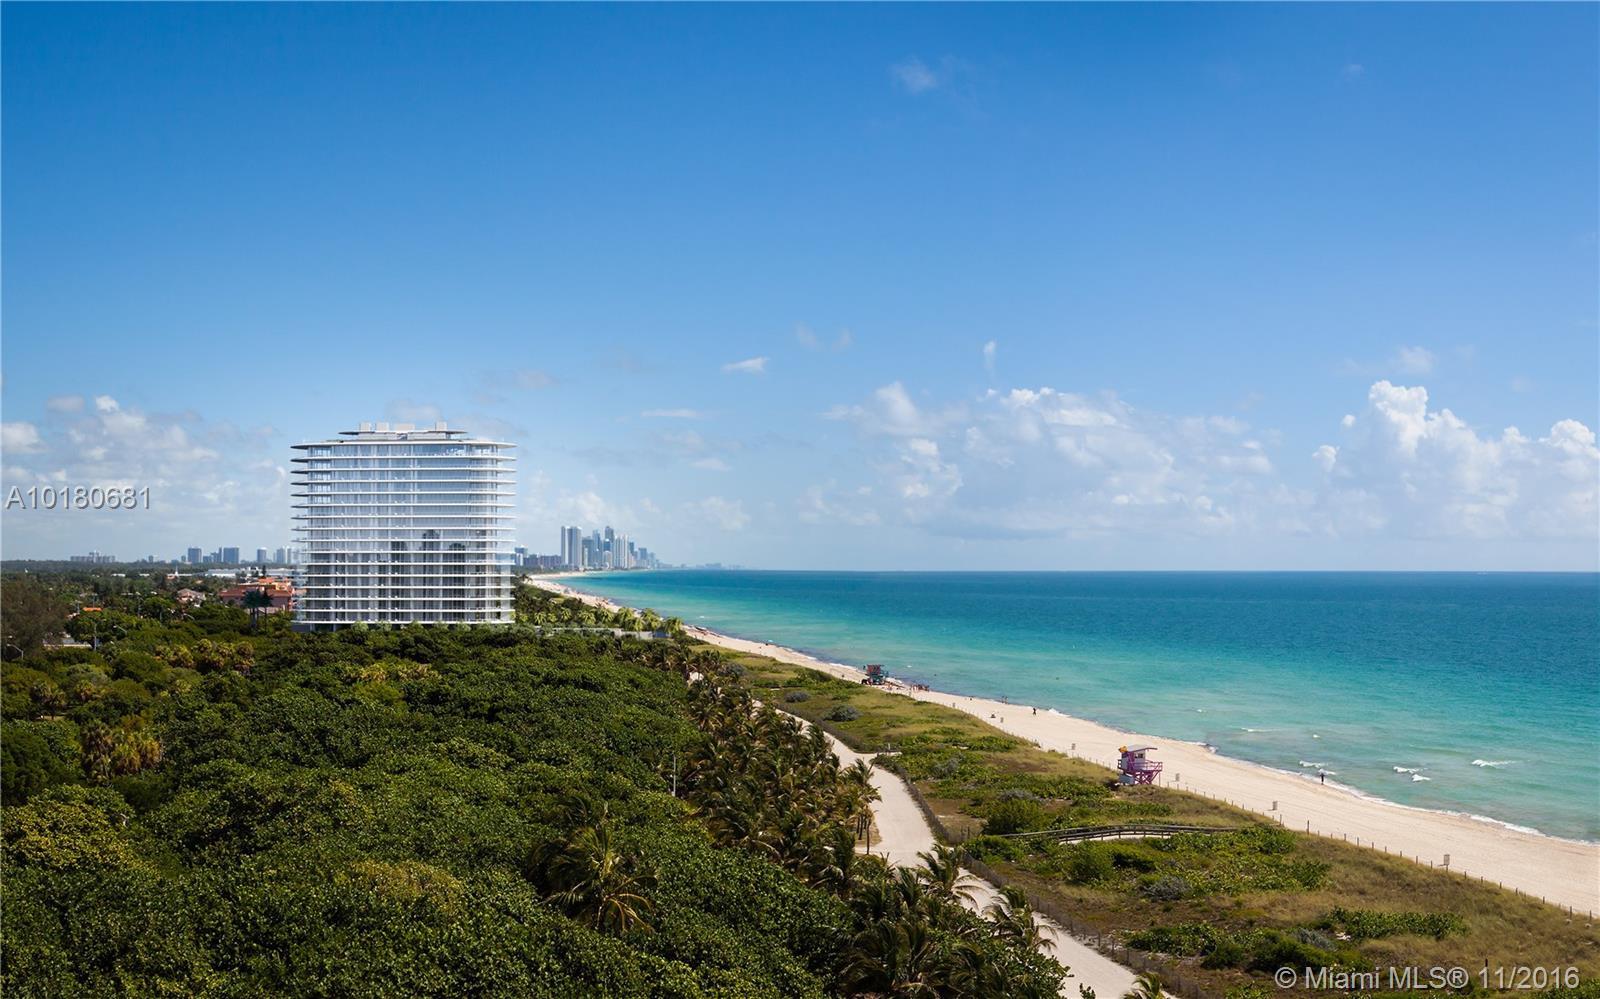 8701 Collins Ave, 601 - Miami Beach, Florida